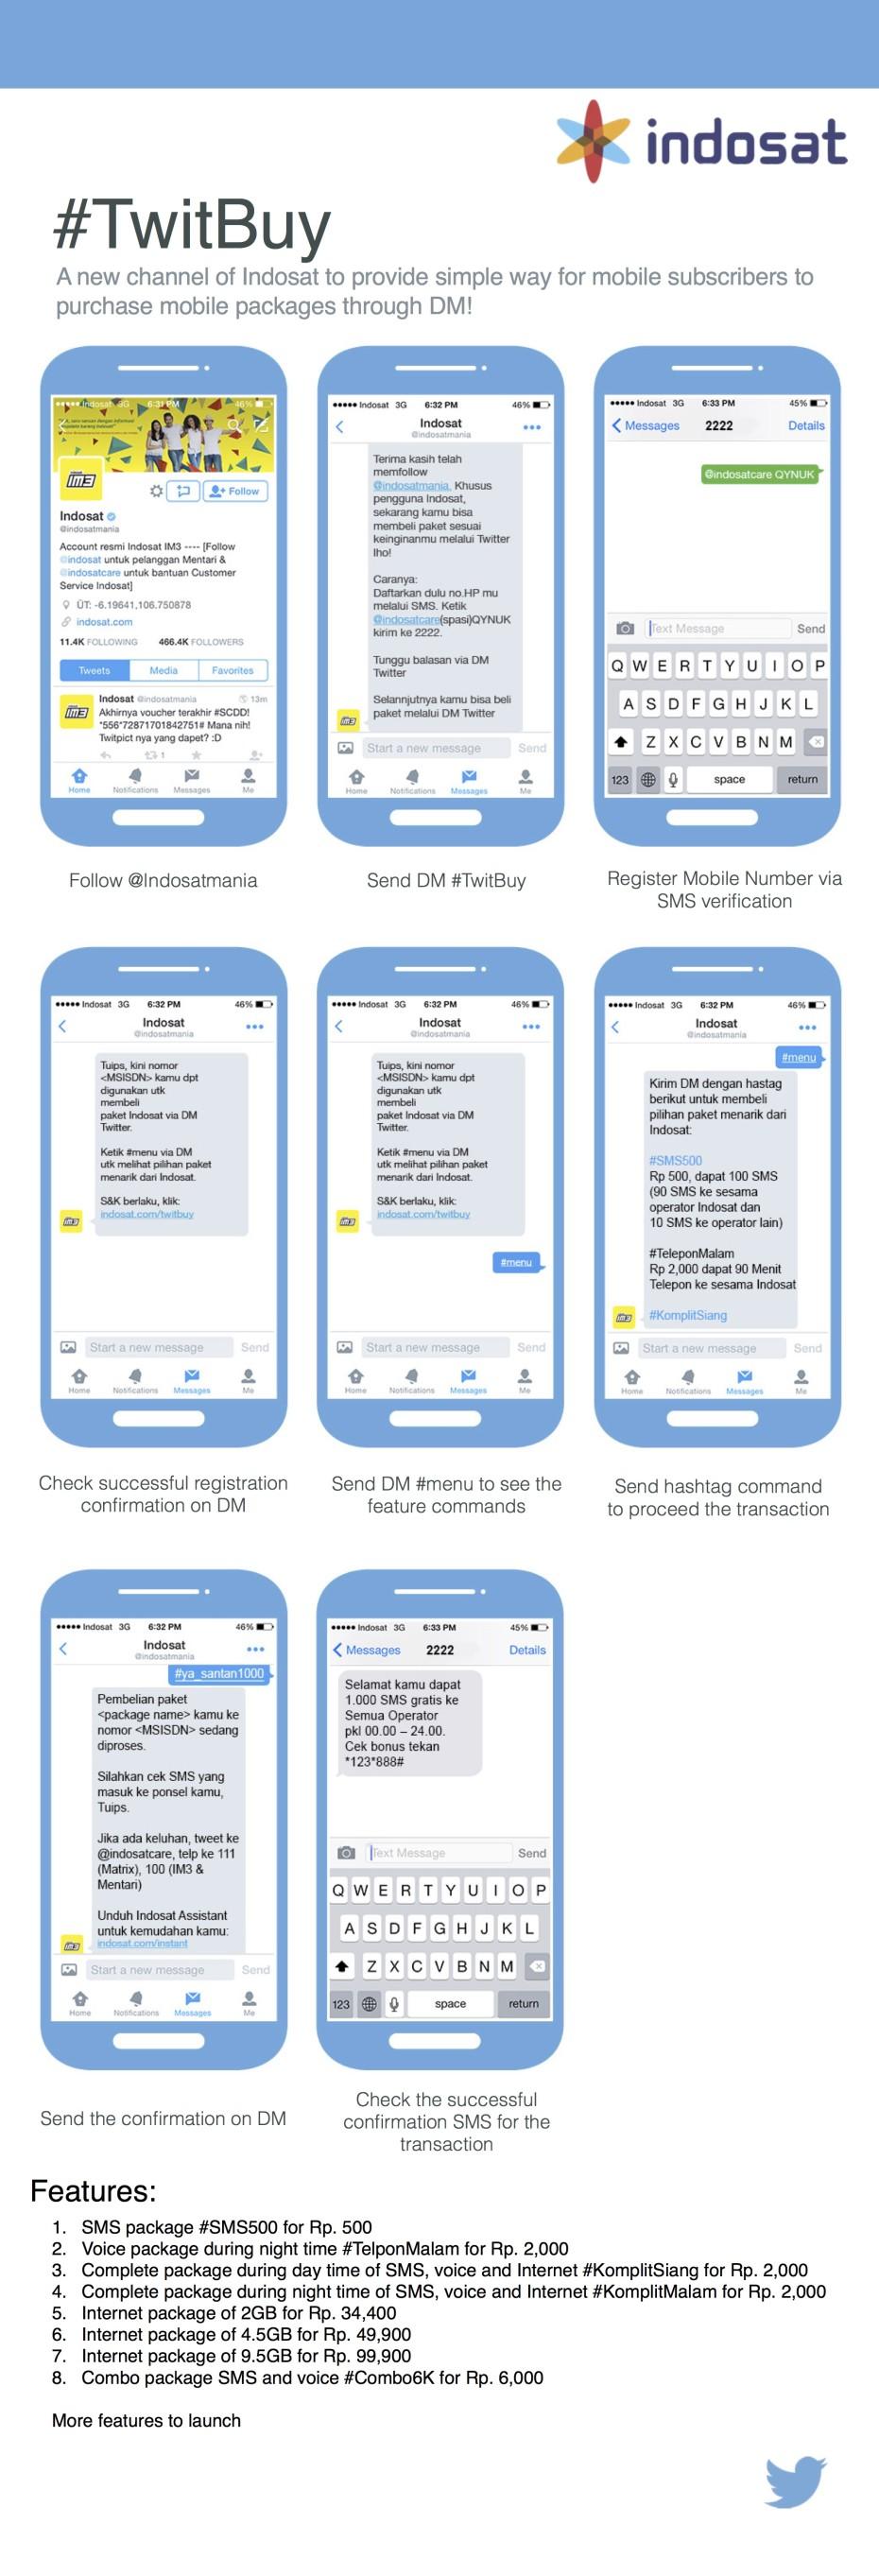 Indosat #Twitbuy Process